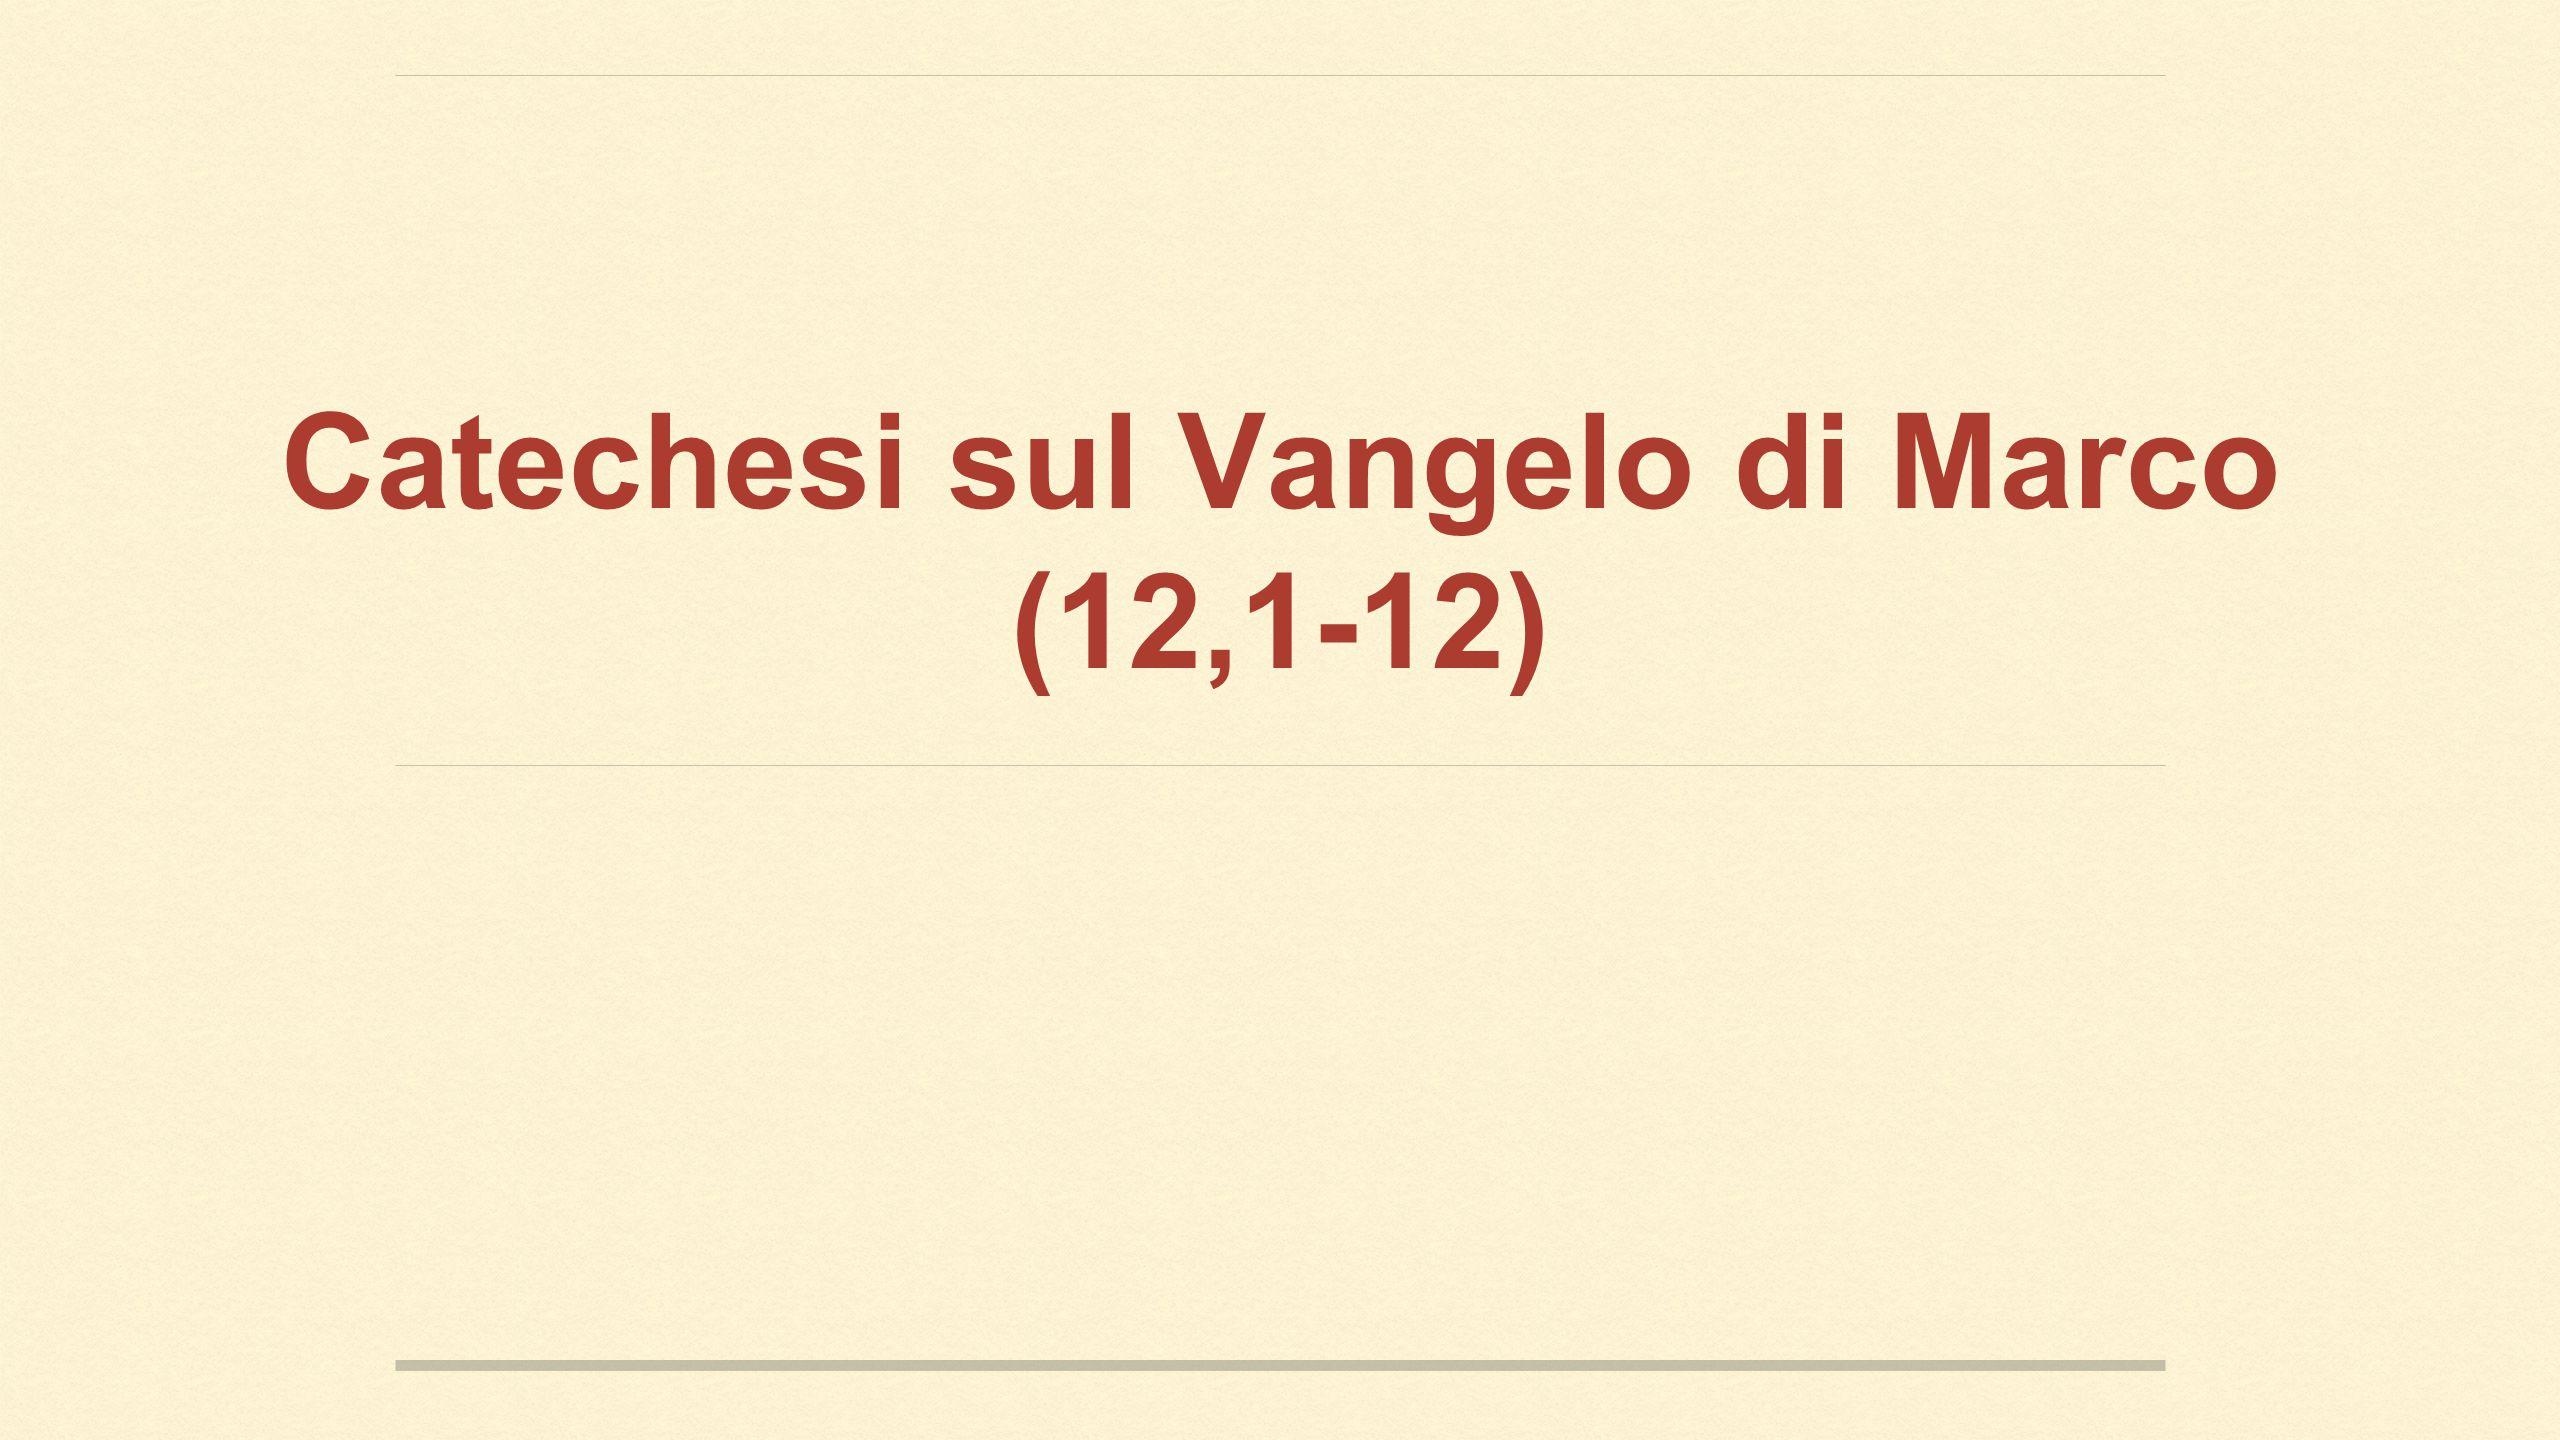 Catechesi sul Vangelo di Marco (12,1-12)